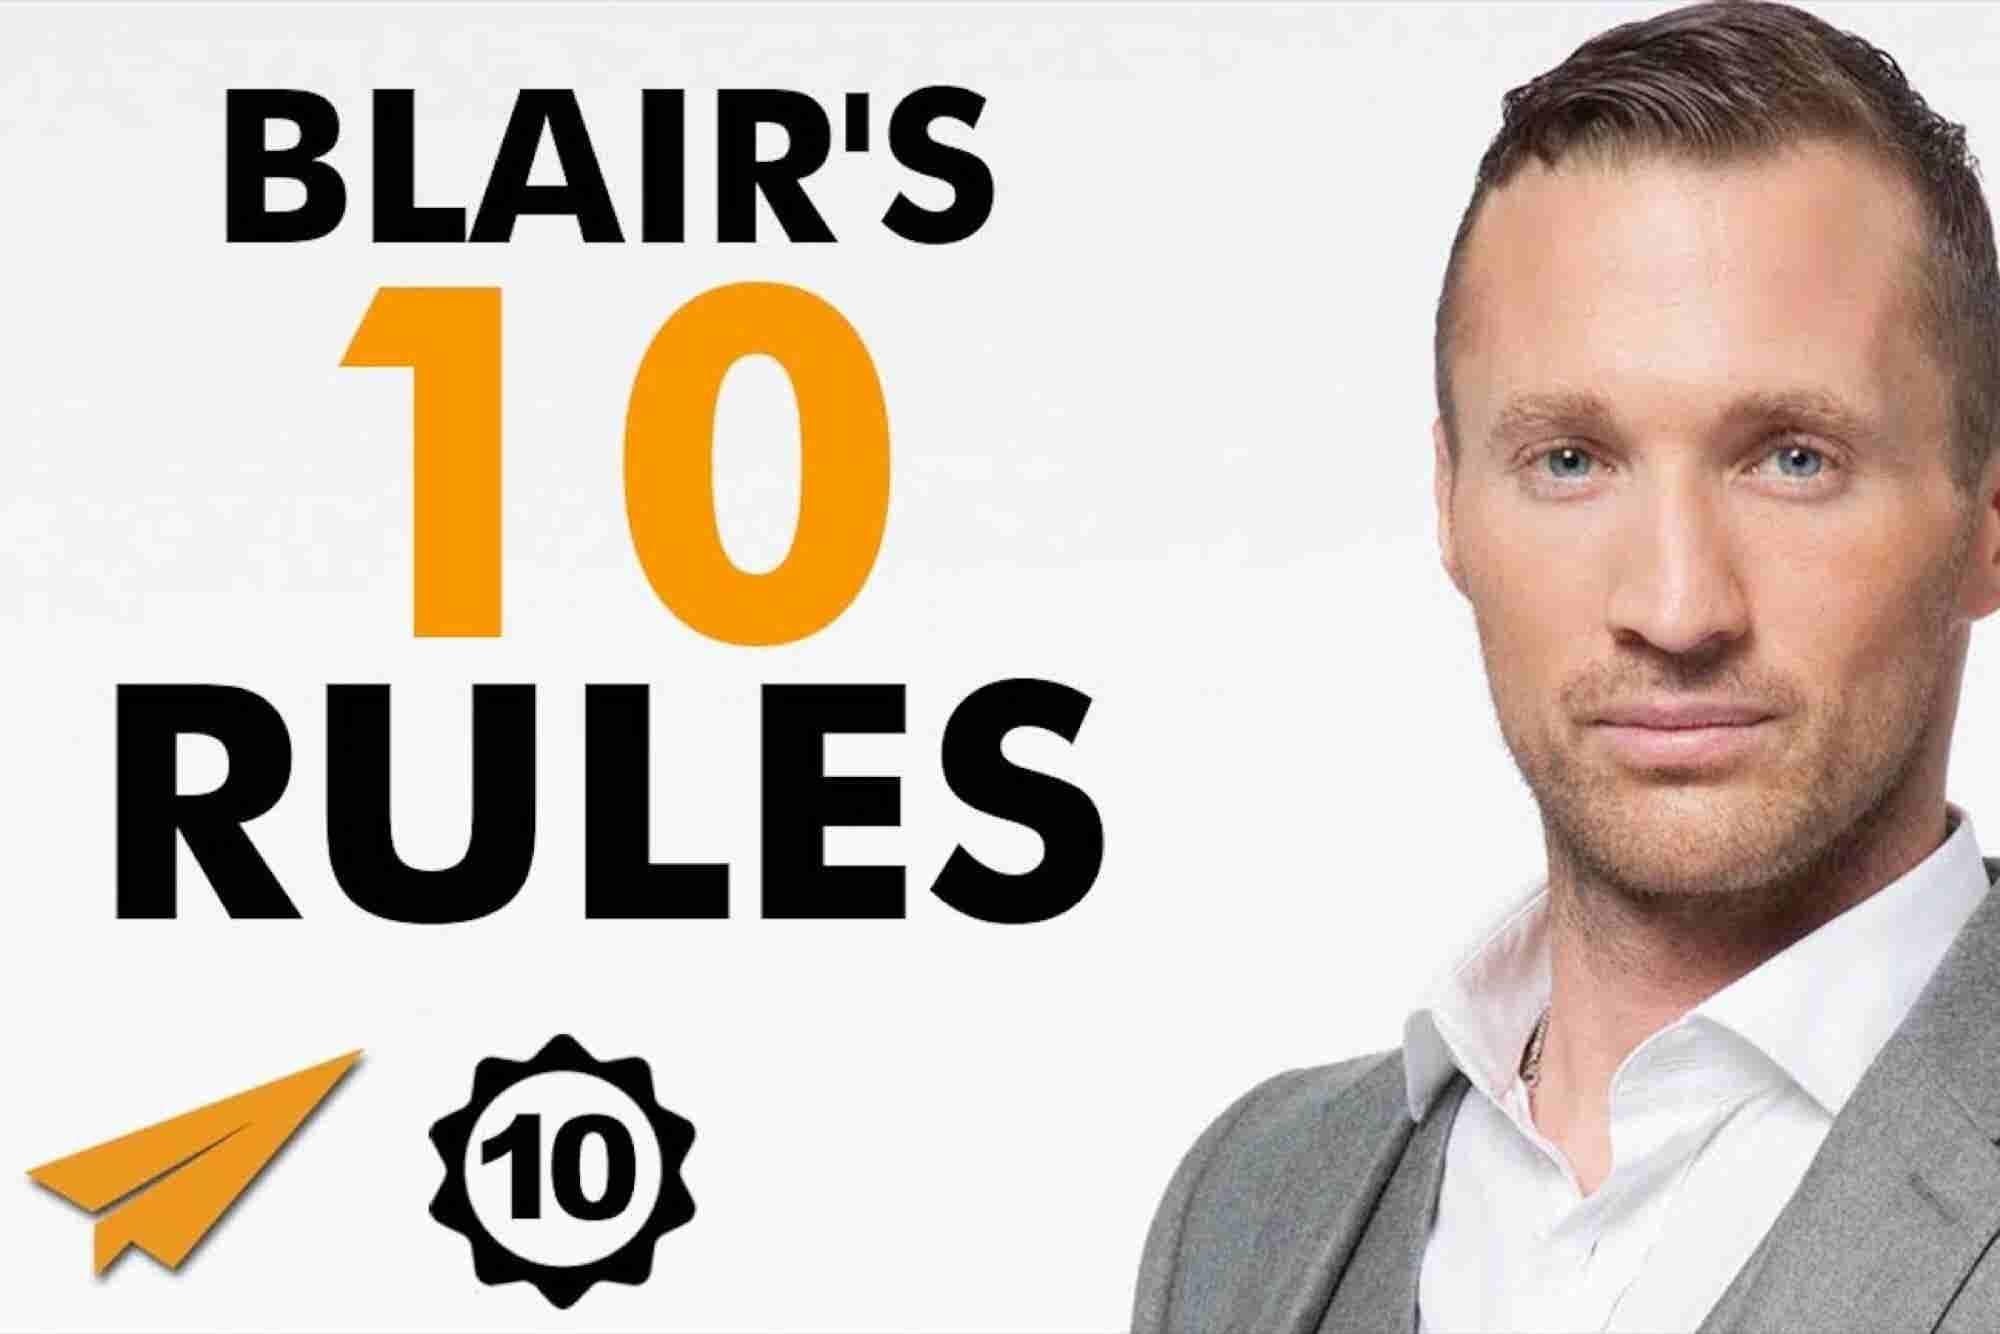 Ryan Blair's Top 10 Rules for Success